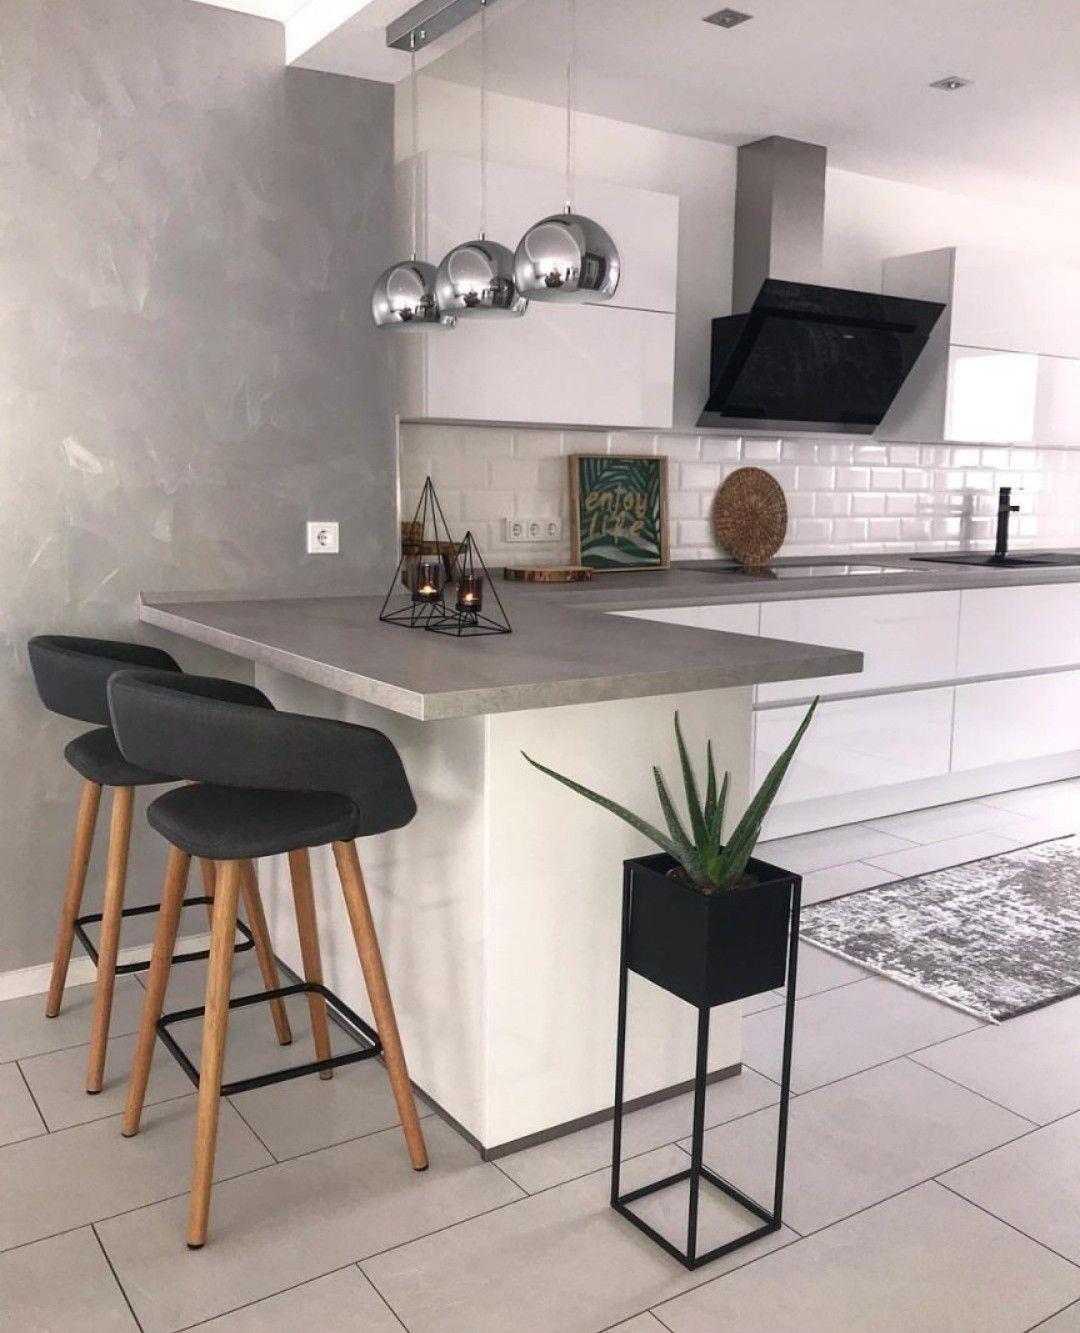 Gaat Om Het Barretje Wohnung Kuche Kuchen Design Haus Kuchen